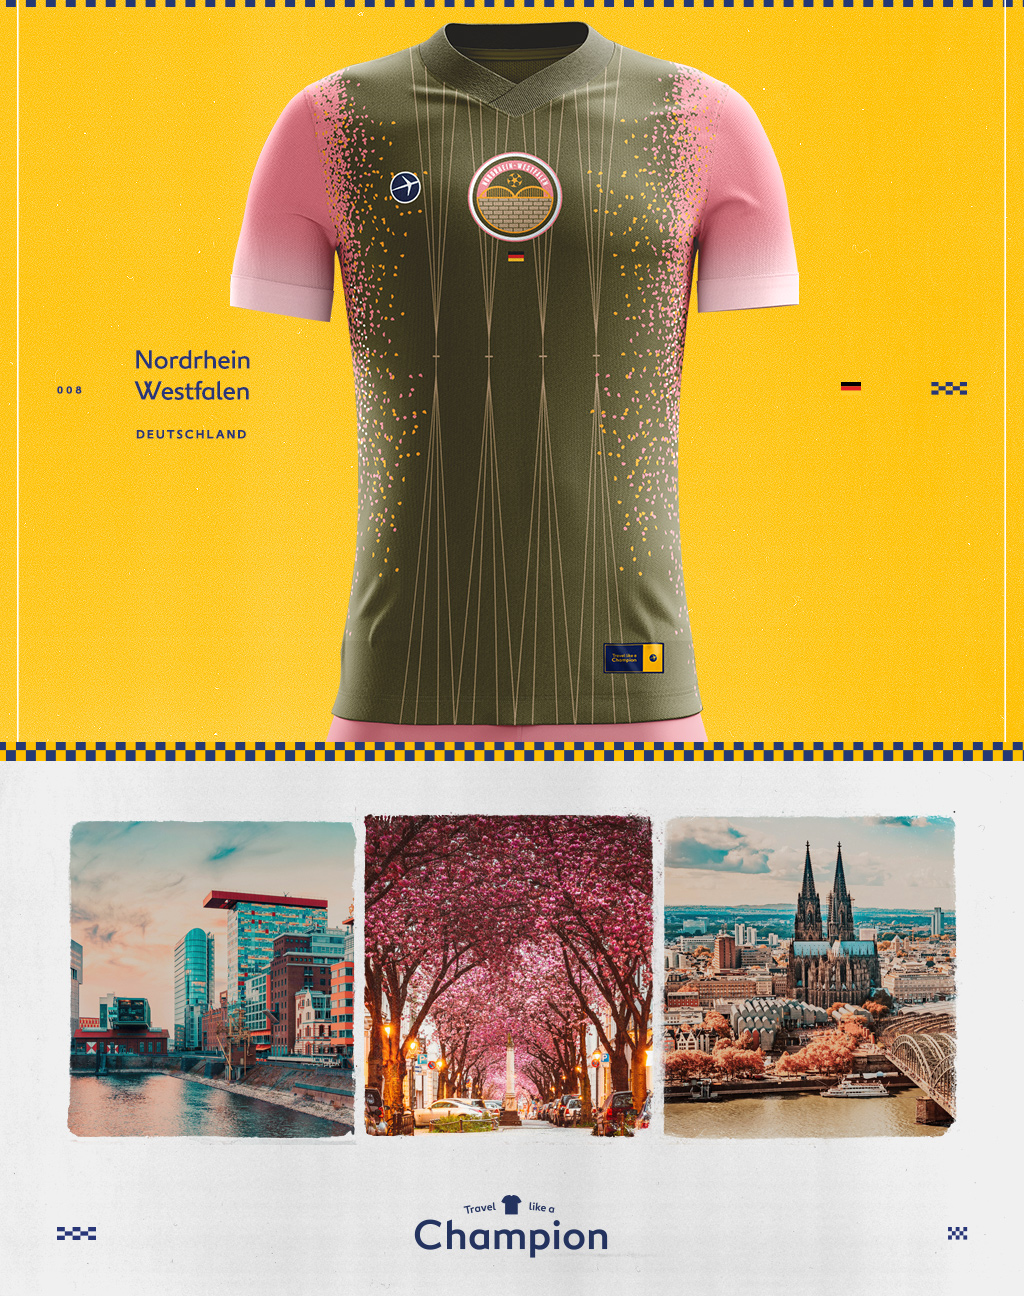 008-nordrhein-blog-article-1024x1296-de.jpg?1556231028